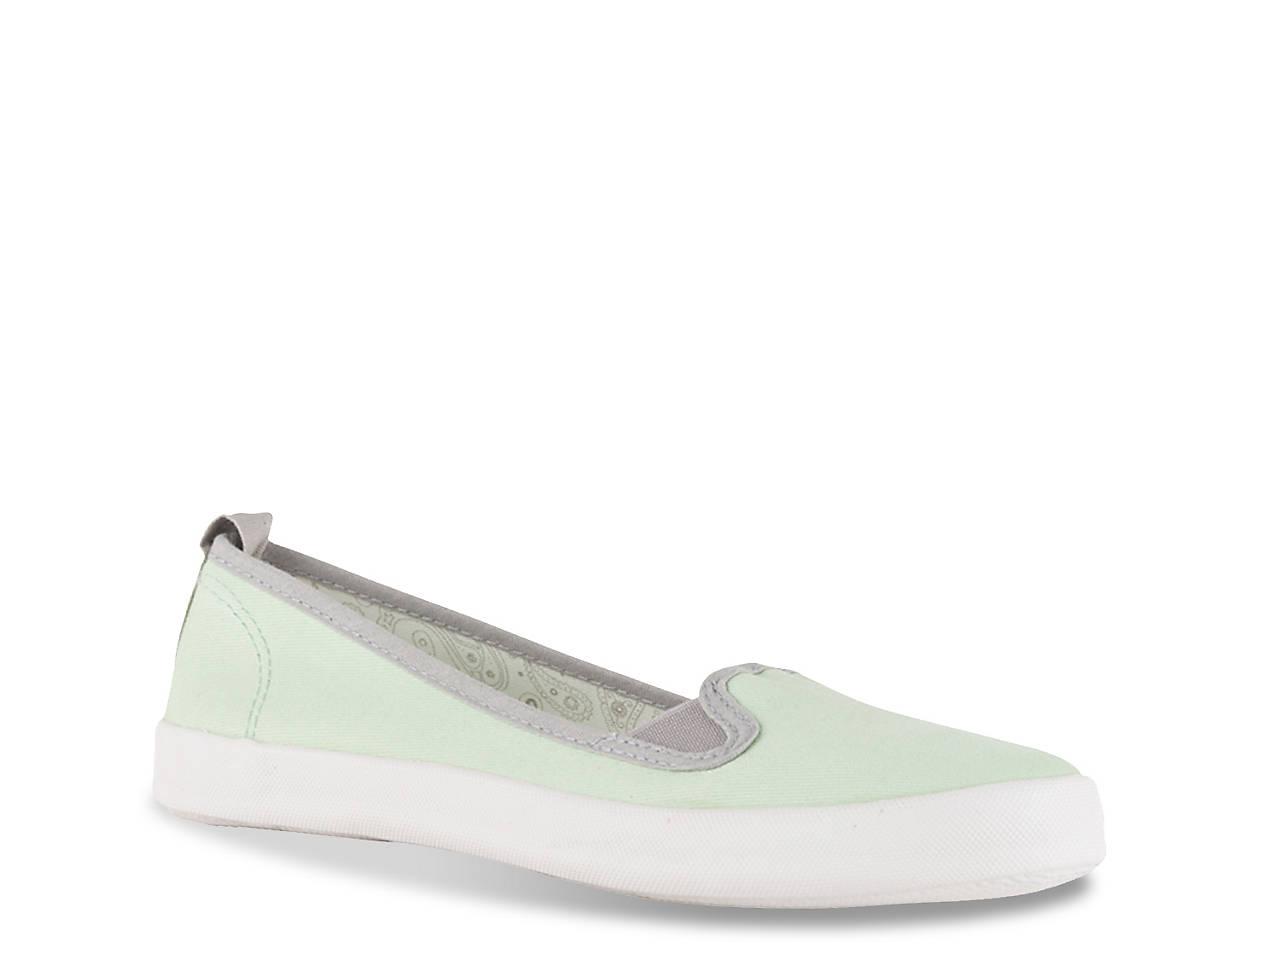 fcee7a2540f6 Lamo Ella Flat Women s Shoes